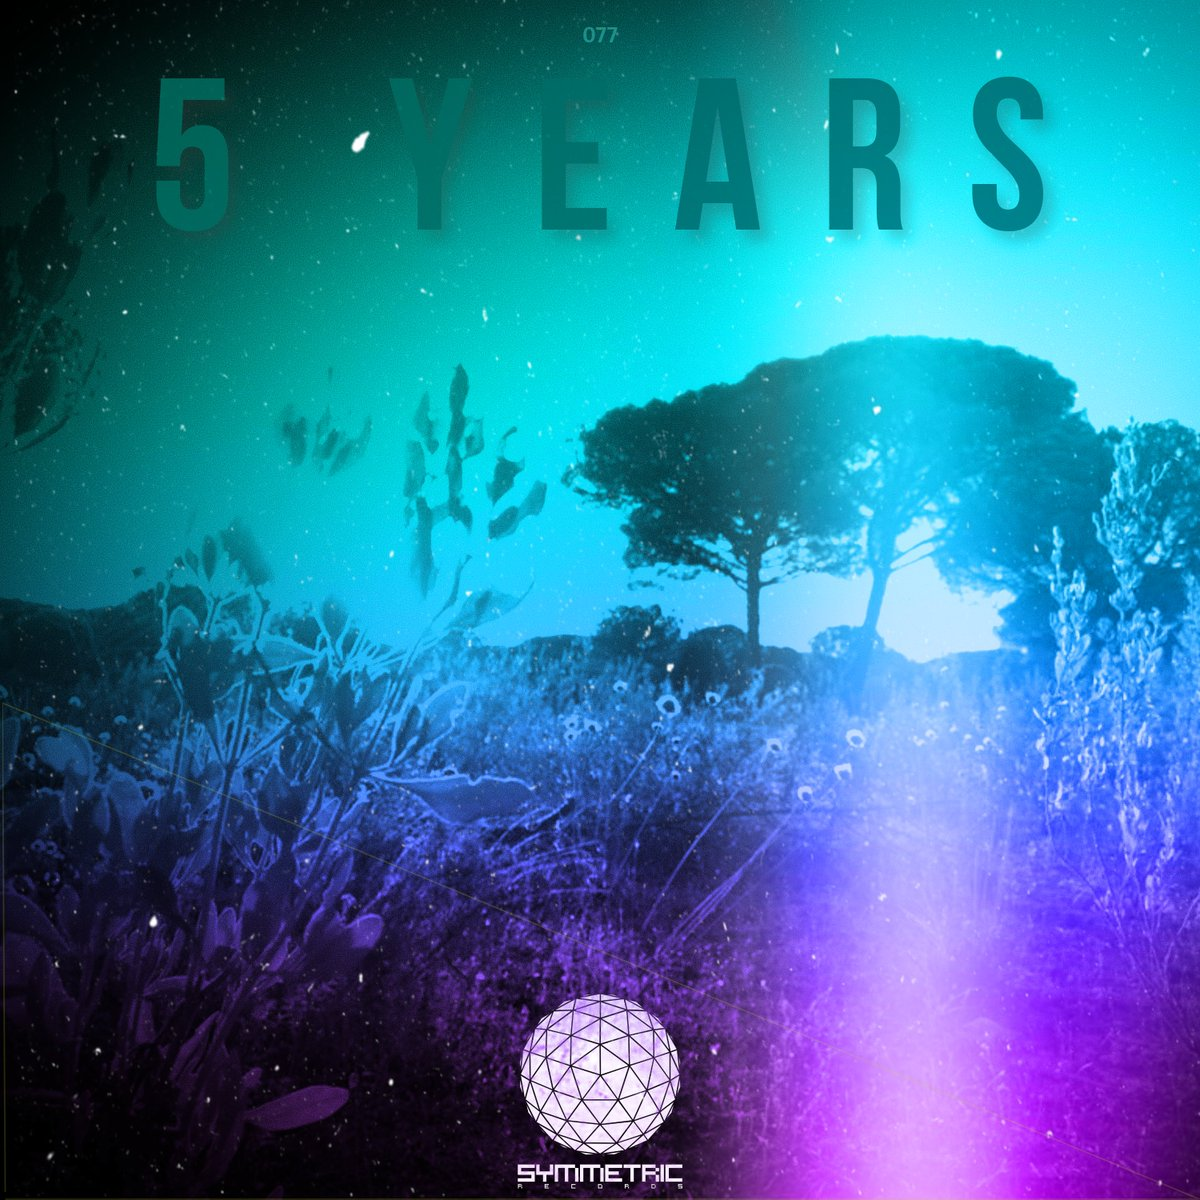 Love to everyone! @releasepromo @PromoPush_UK @DecodedMag @EGpodcast #progressivehouse #technomusic #deephouse #melodictechno #melodichouse #electronicmusic<br>http://pic.twitter.com/ijPPyg8Dnj